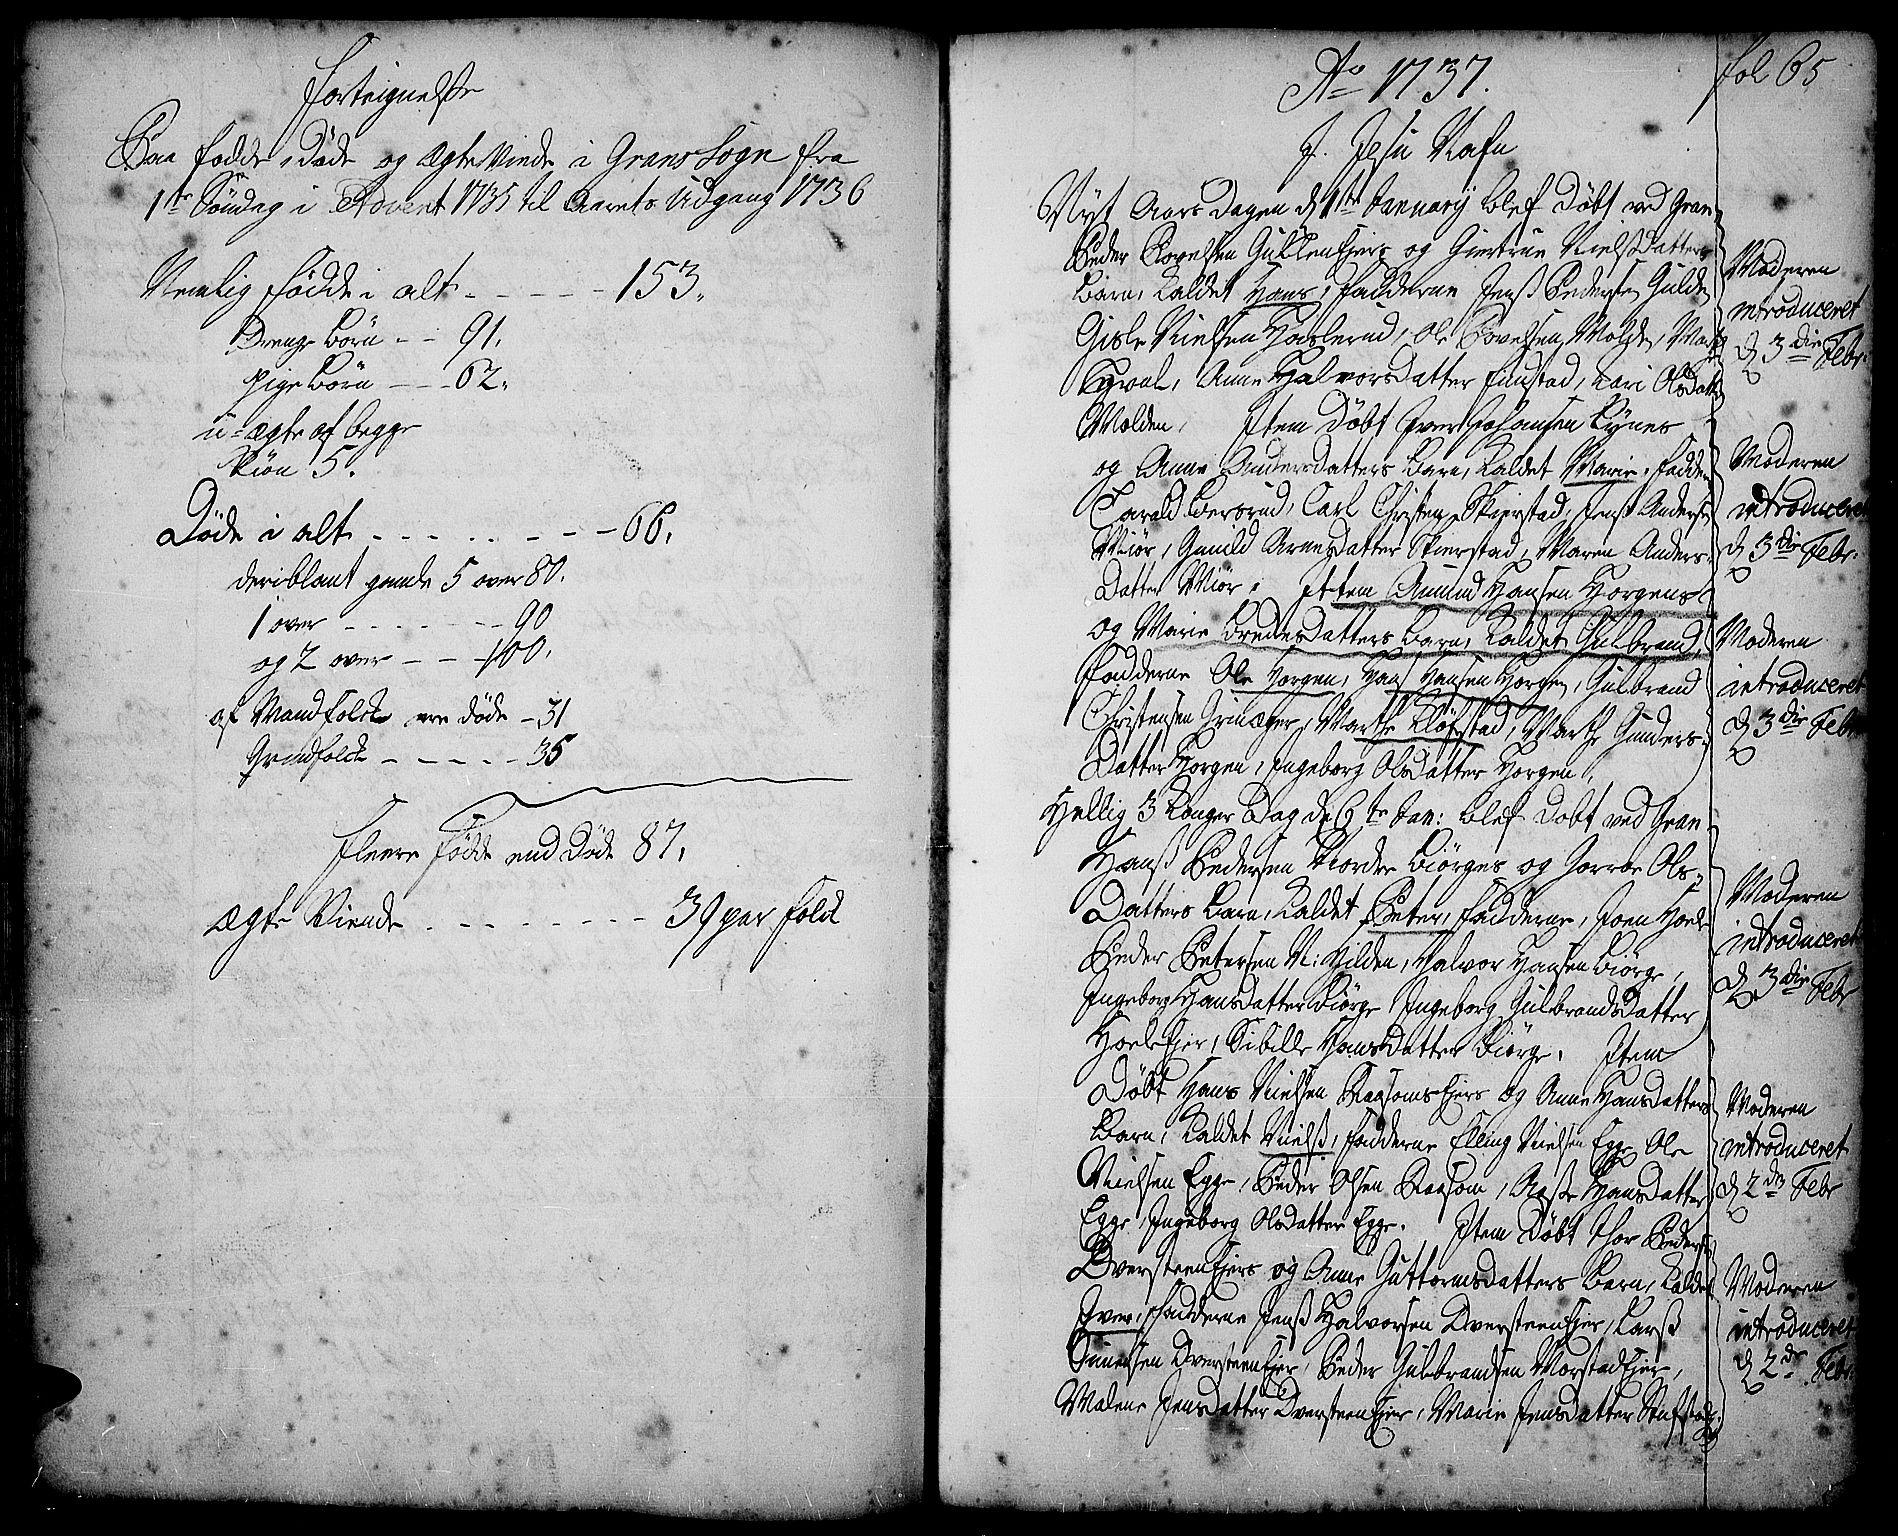 SAH, Gran prestekontor, Ministerialbok nr. 2, 1732-1744, s. 65